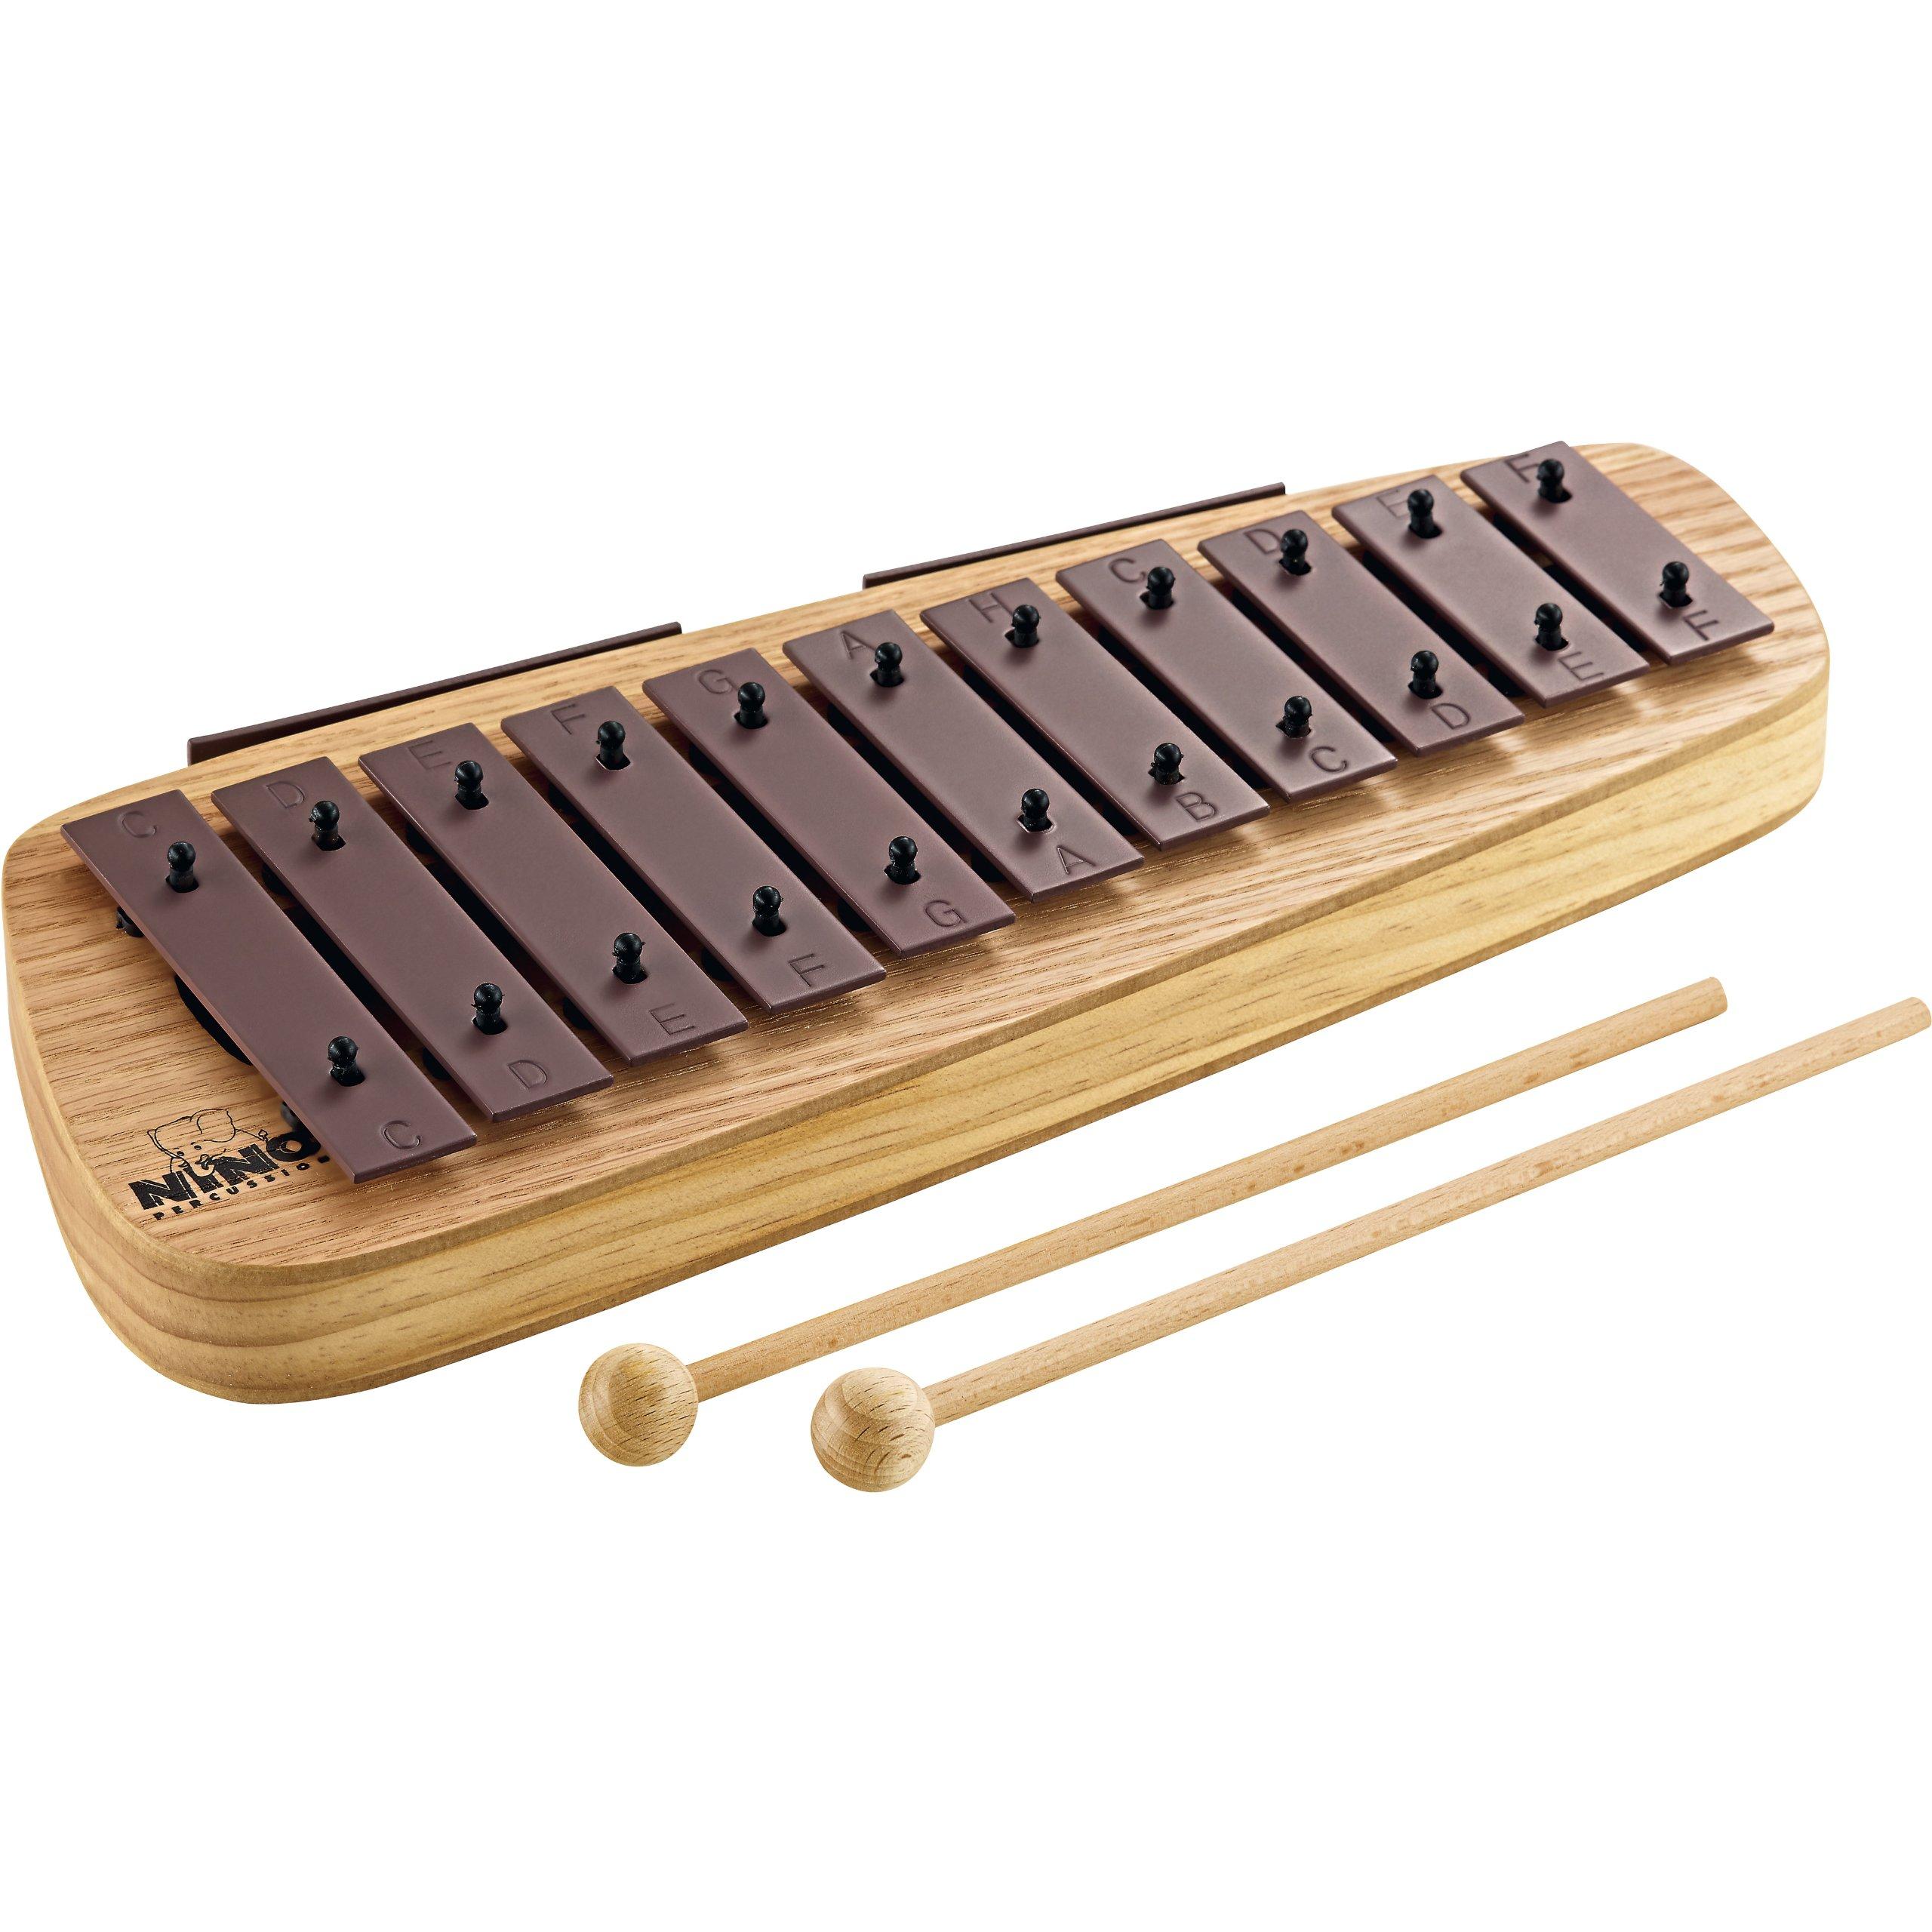 Nino Percussion Glockenspiel (NINO902) by Nino Percussion